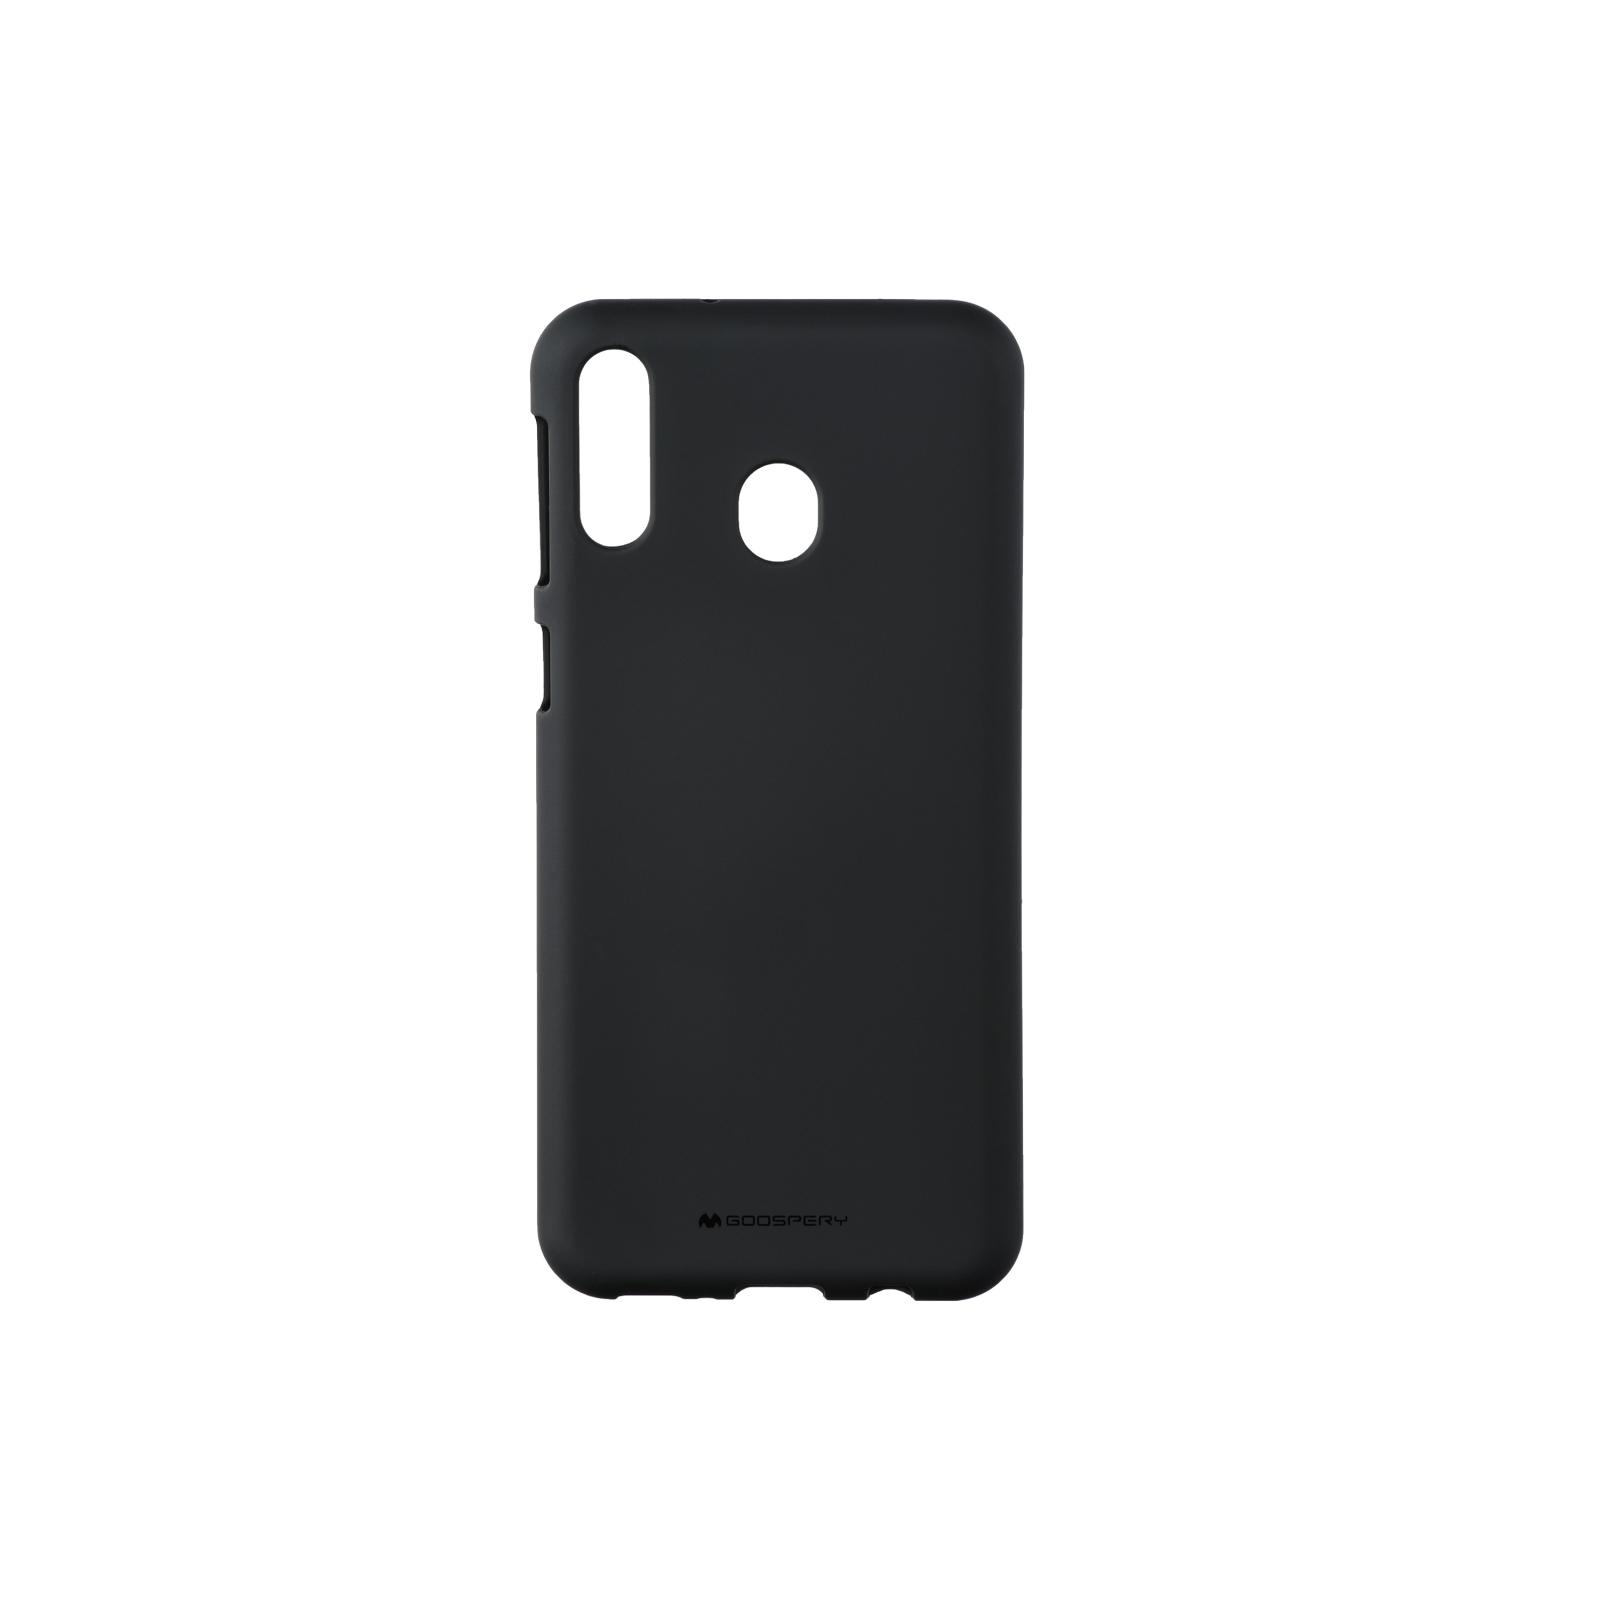 Чехол для моб. телефона Goospery Samsung Galaxy M20 (M205), SF JELLY, PINK (8809661780762)